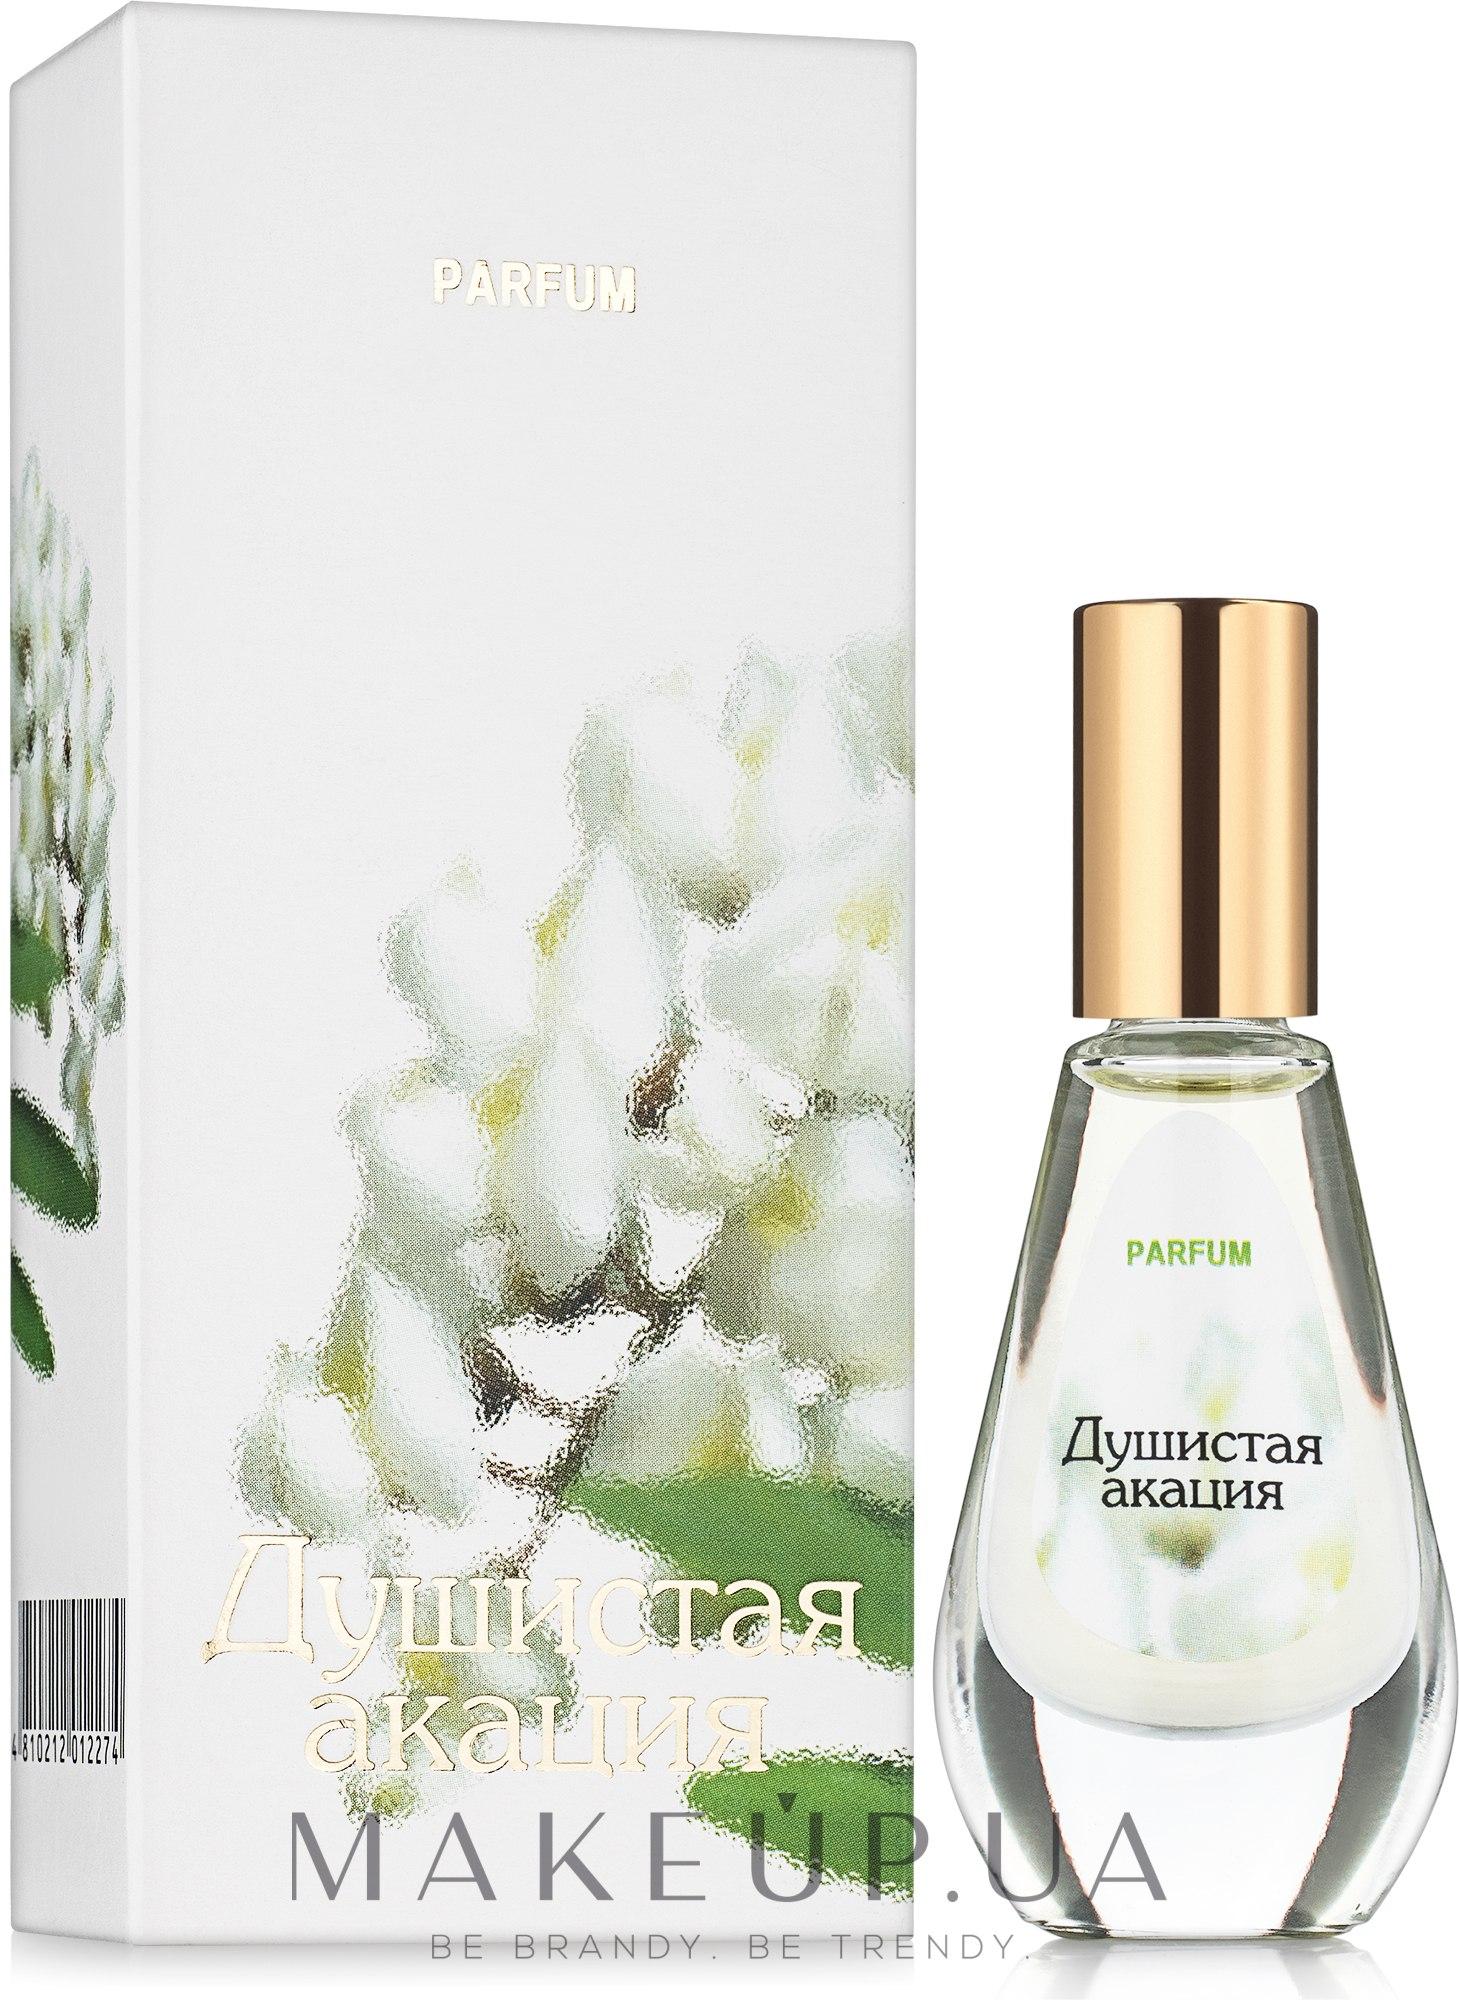 Dilis Parfum Floral Collection Душистая Акация - Духи — фото 9.5ml